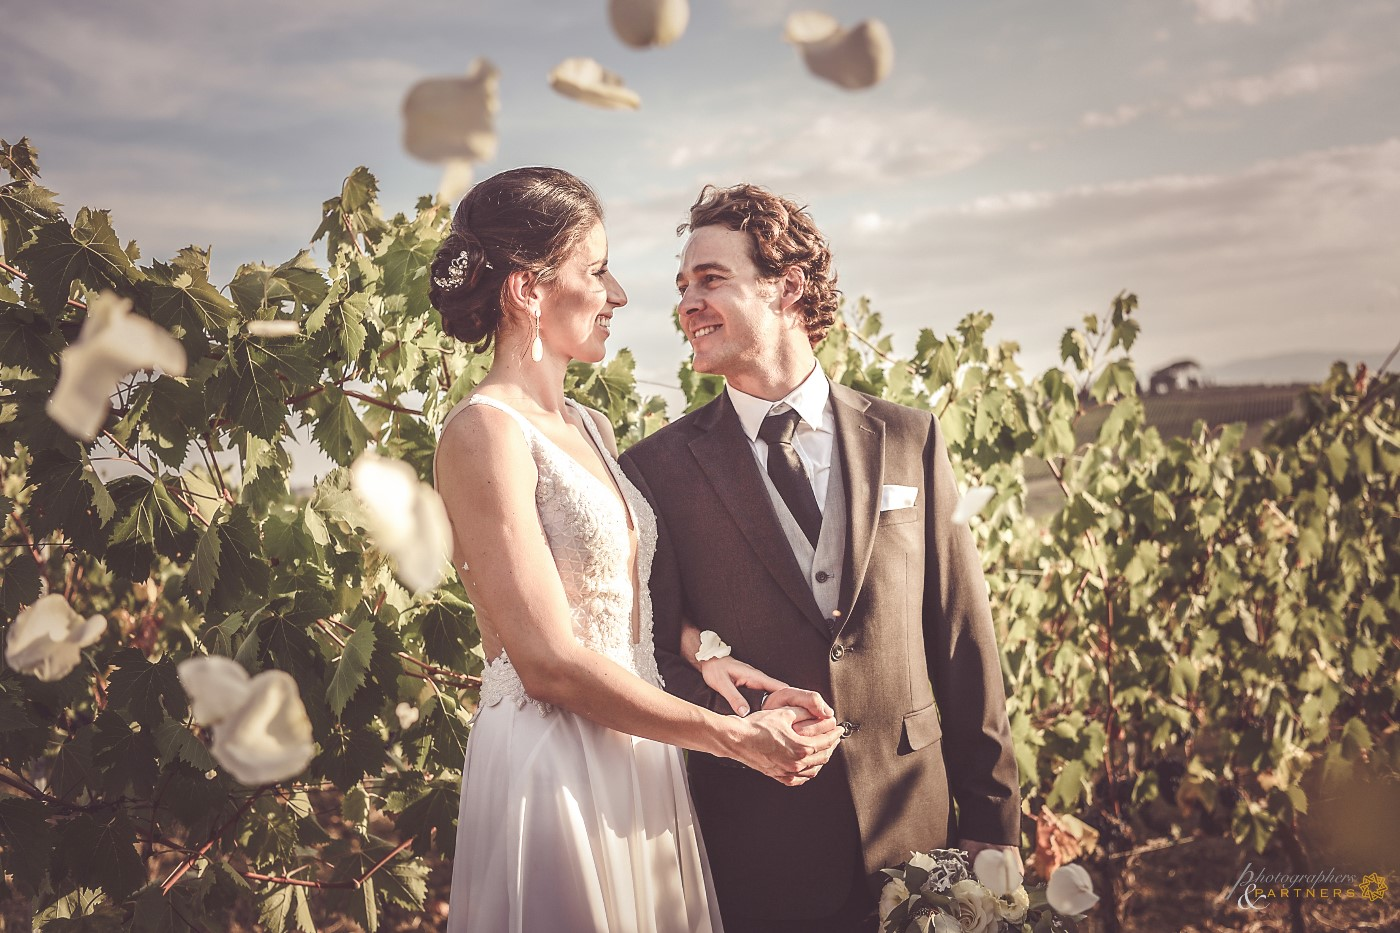 photographer_weddings_montepulciano_13.jpg